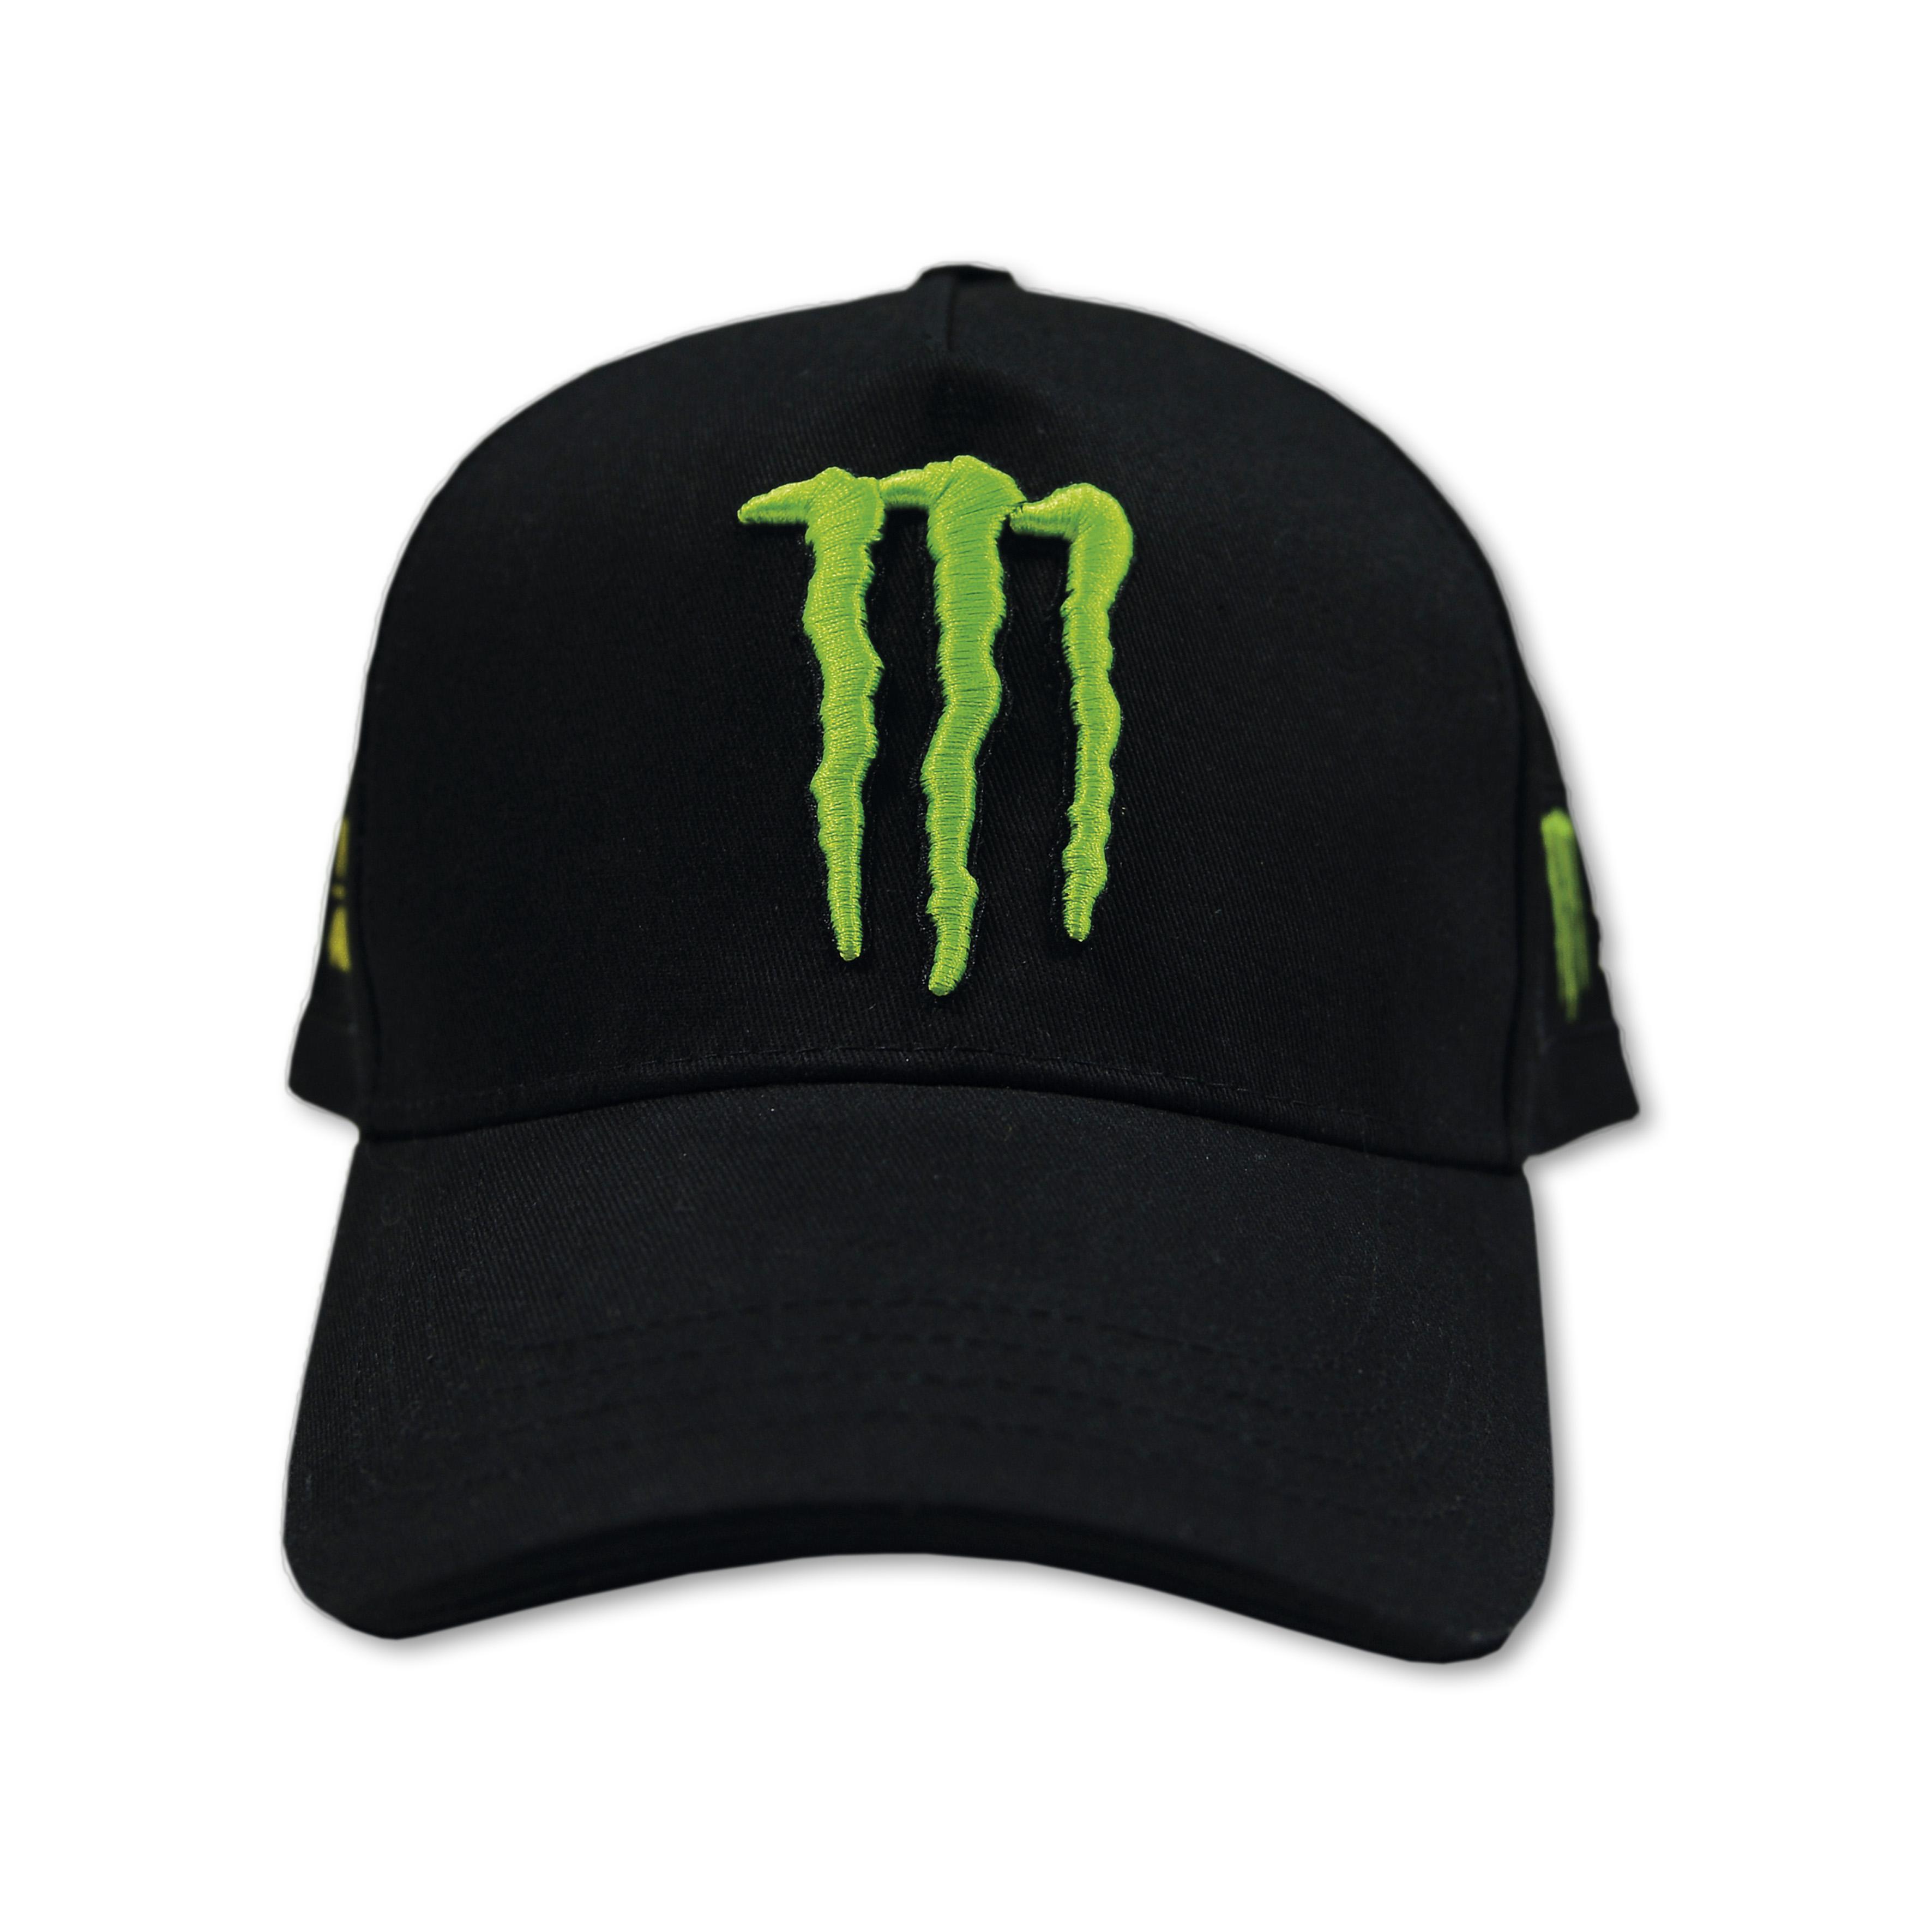 eb912d56627 Vr46 VR Monster Cap Valentino Rossi buy and offers on Motardinn